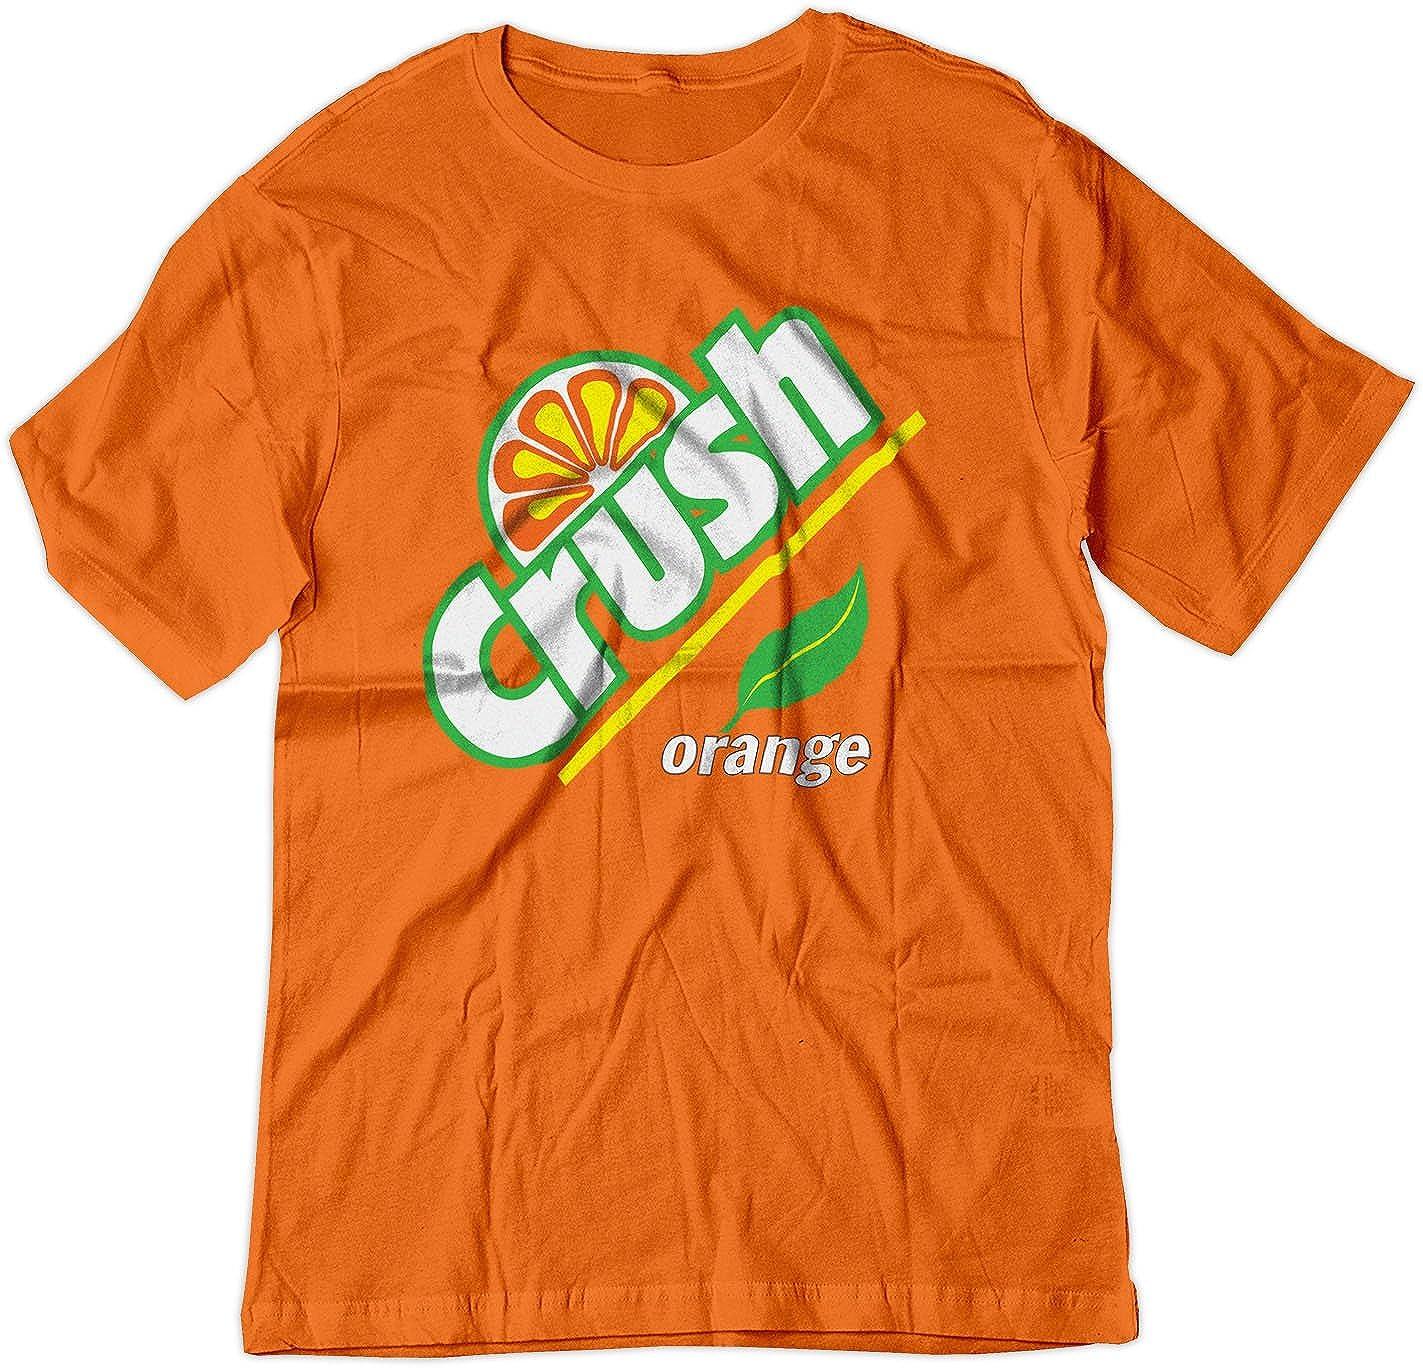 BSW YOUTH Orange Crush Carbonated Soda Beverage Vintage Shirt 1254-1Y